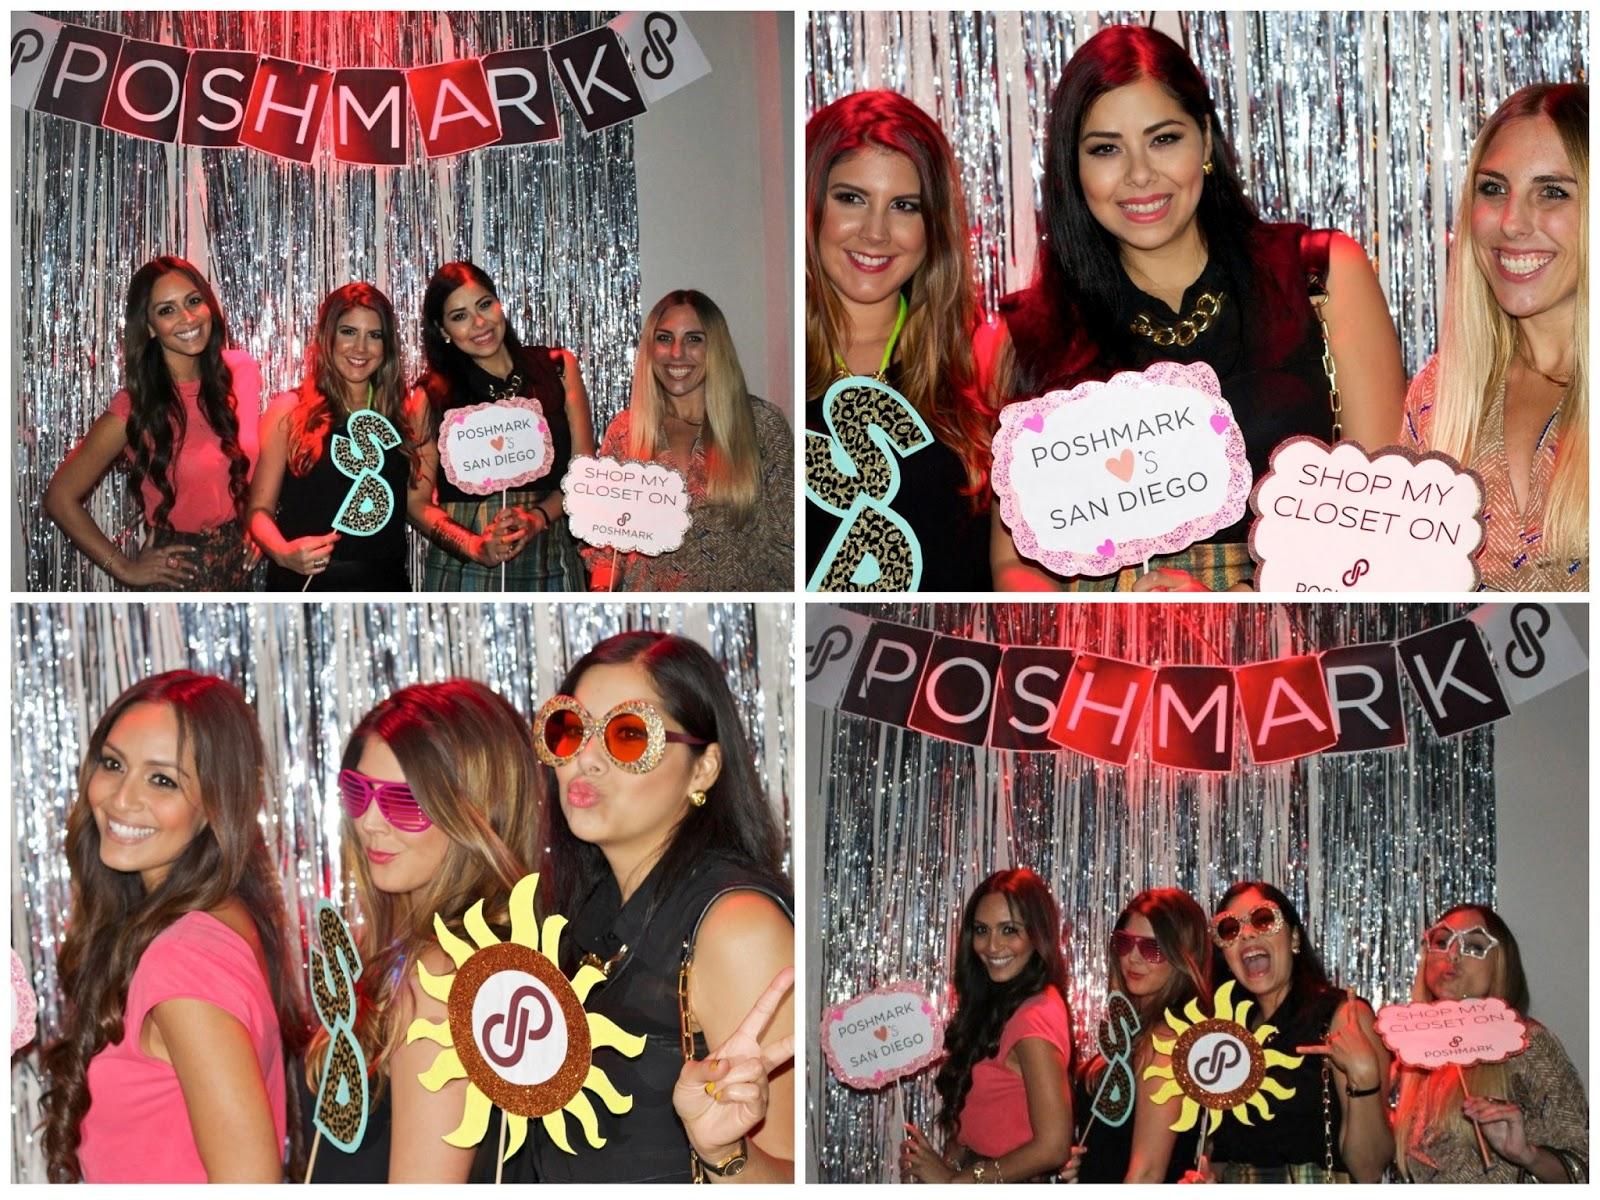 Poshmark San Diego, Poshmark Party San Diego, Poshmark APp in San Diego, San Diego Poshmark Seller